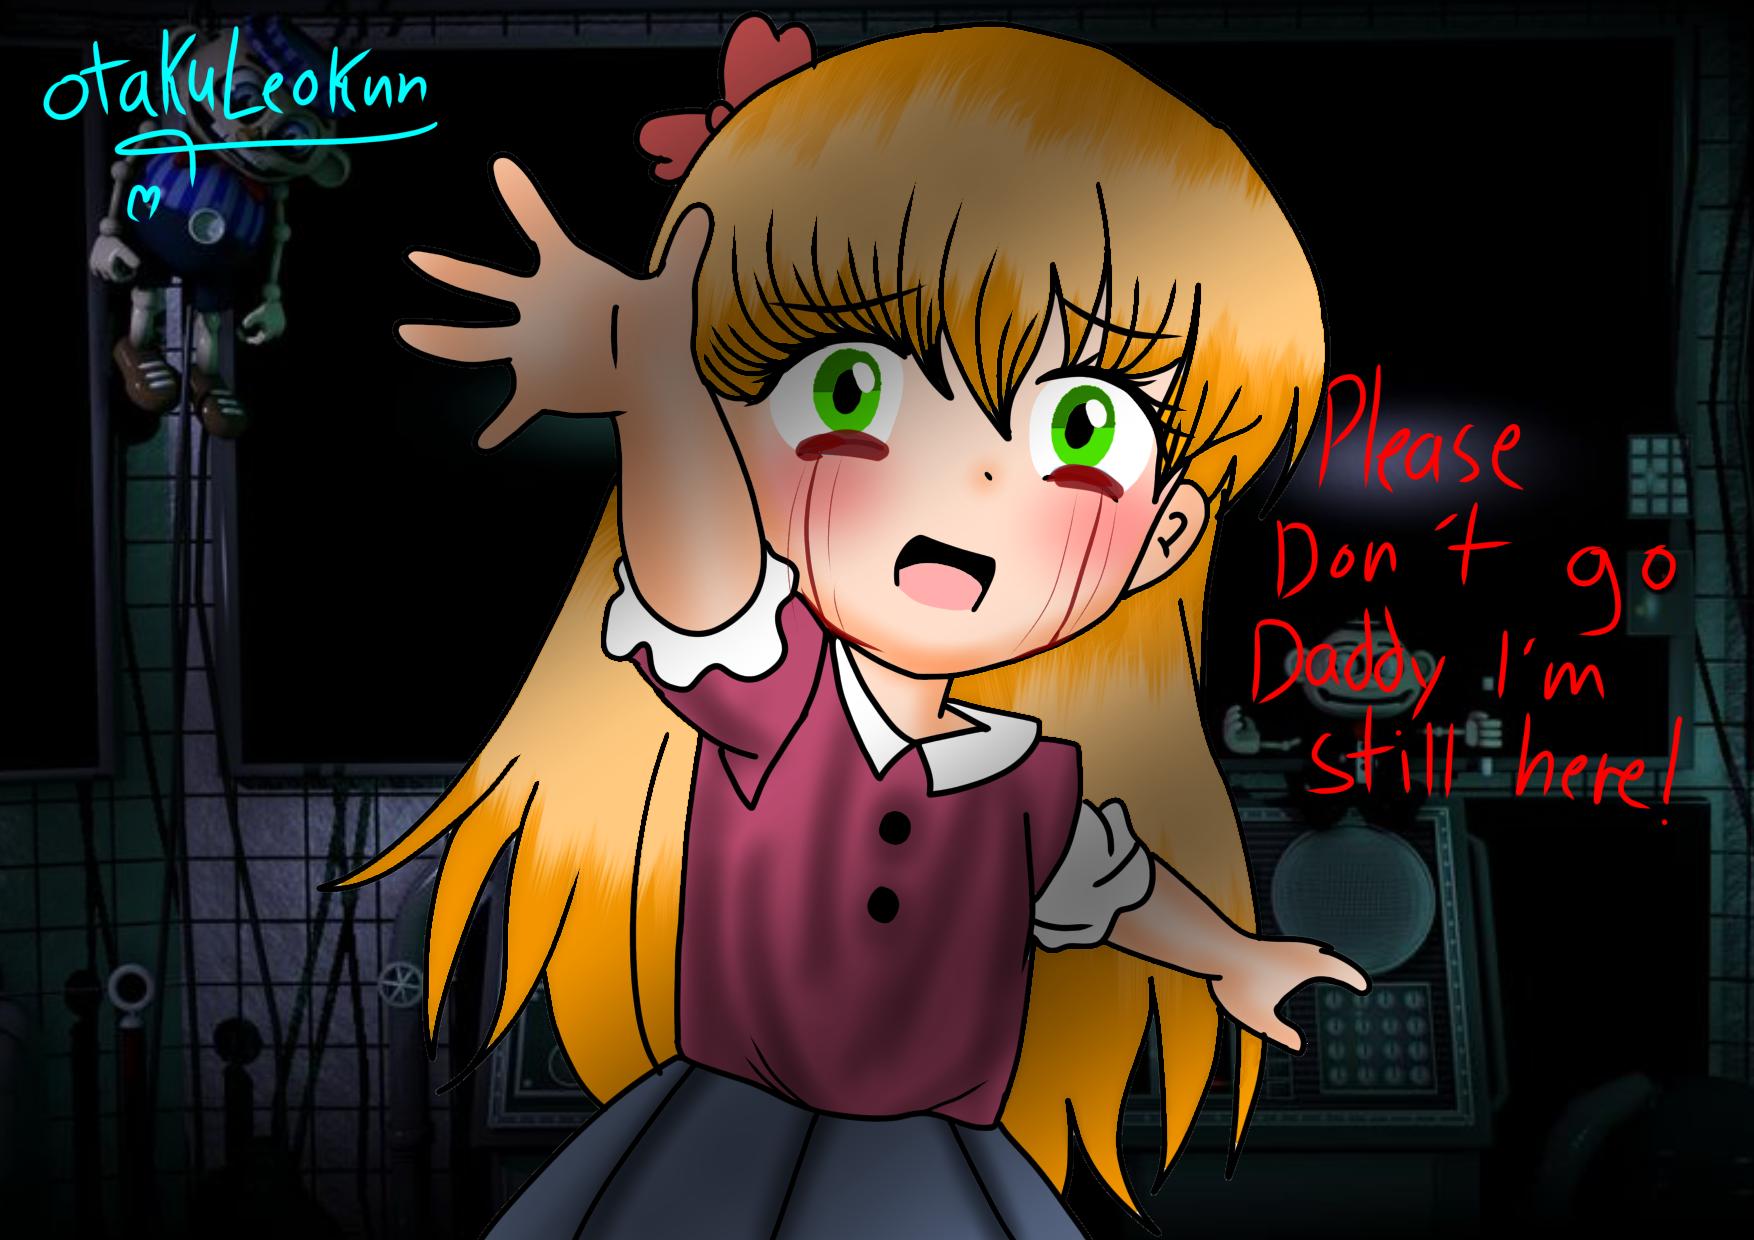 Elizabeth Afton Fnaf In 2020 Fnaf Drawings Fnaf Anime Fnaf